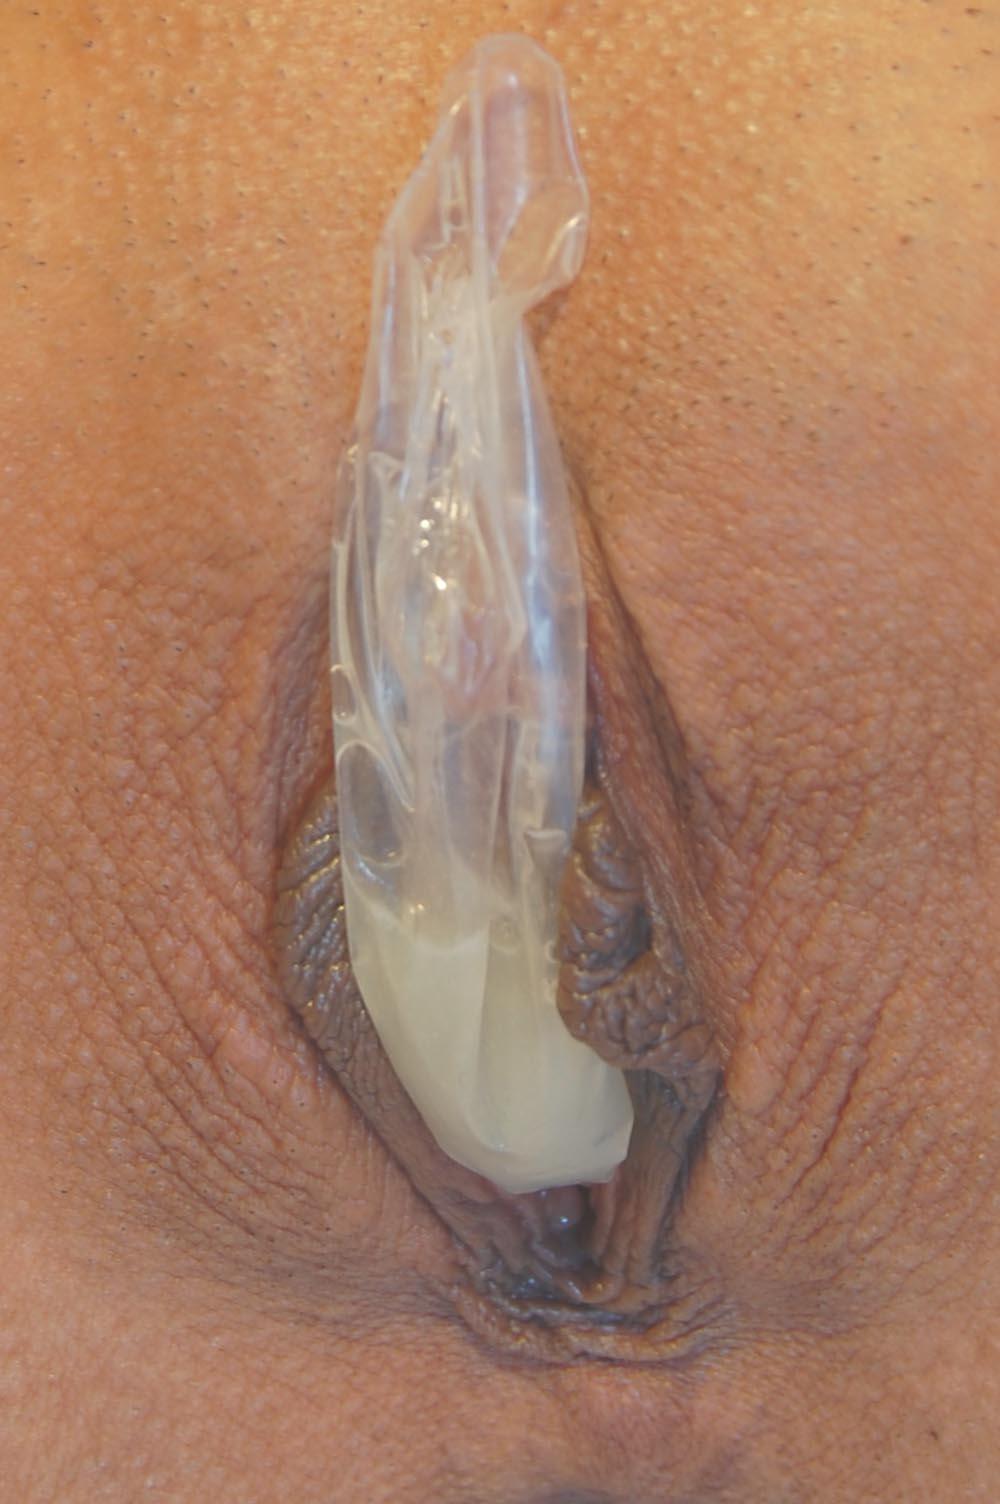 nude-condom-sense-skin-deep-nude-male-black-penis